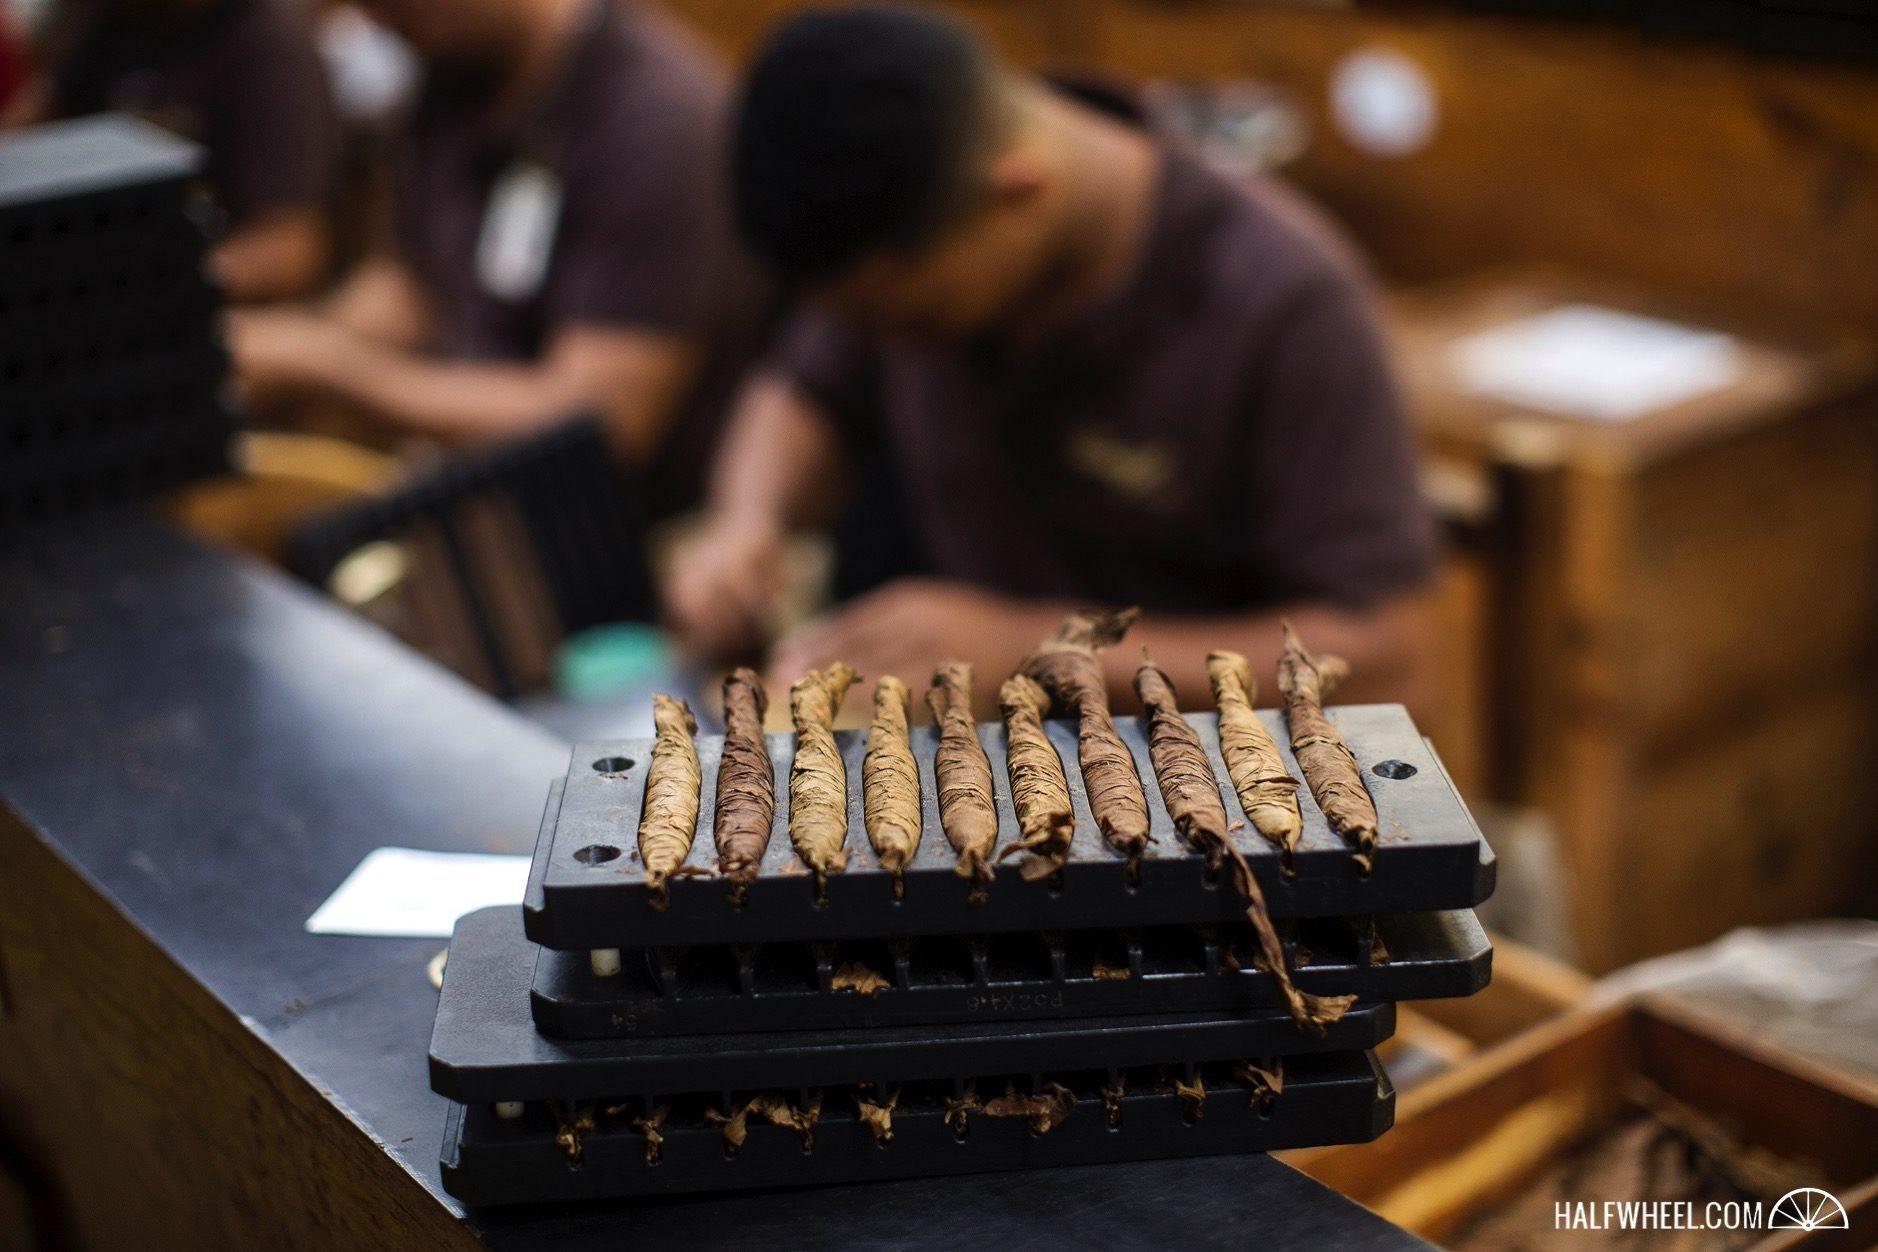 Cigars Davidoff molds